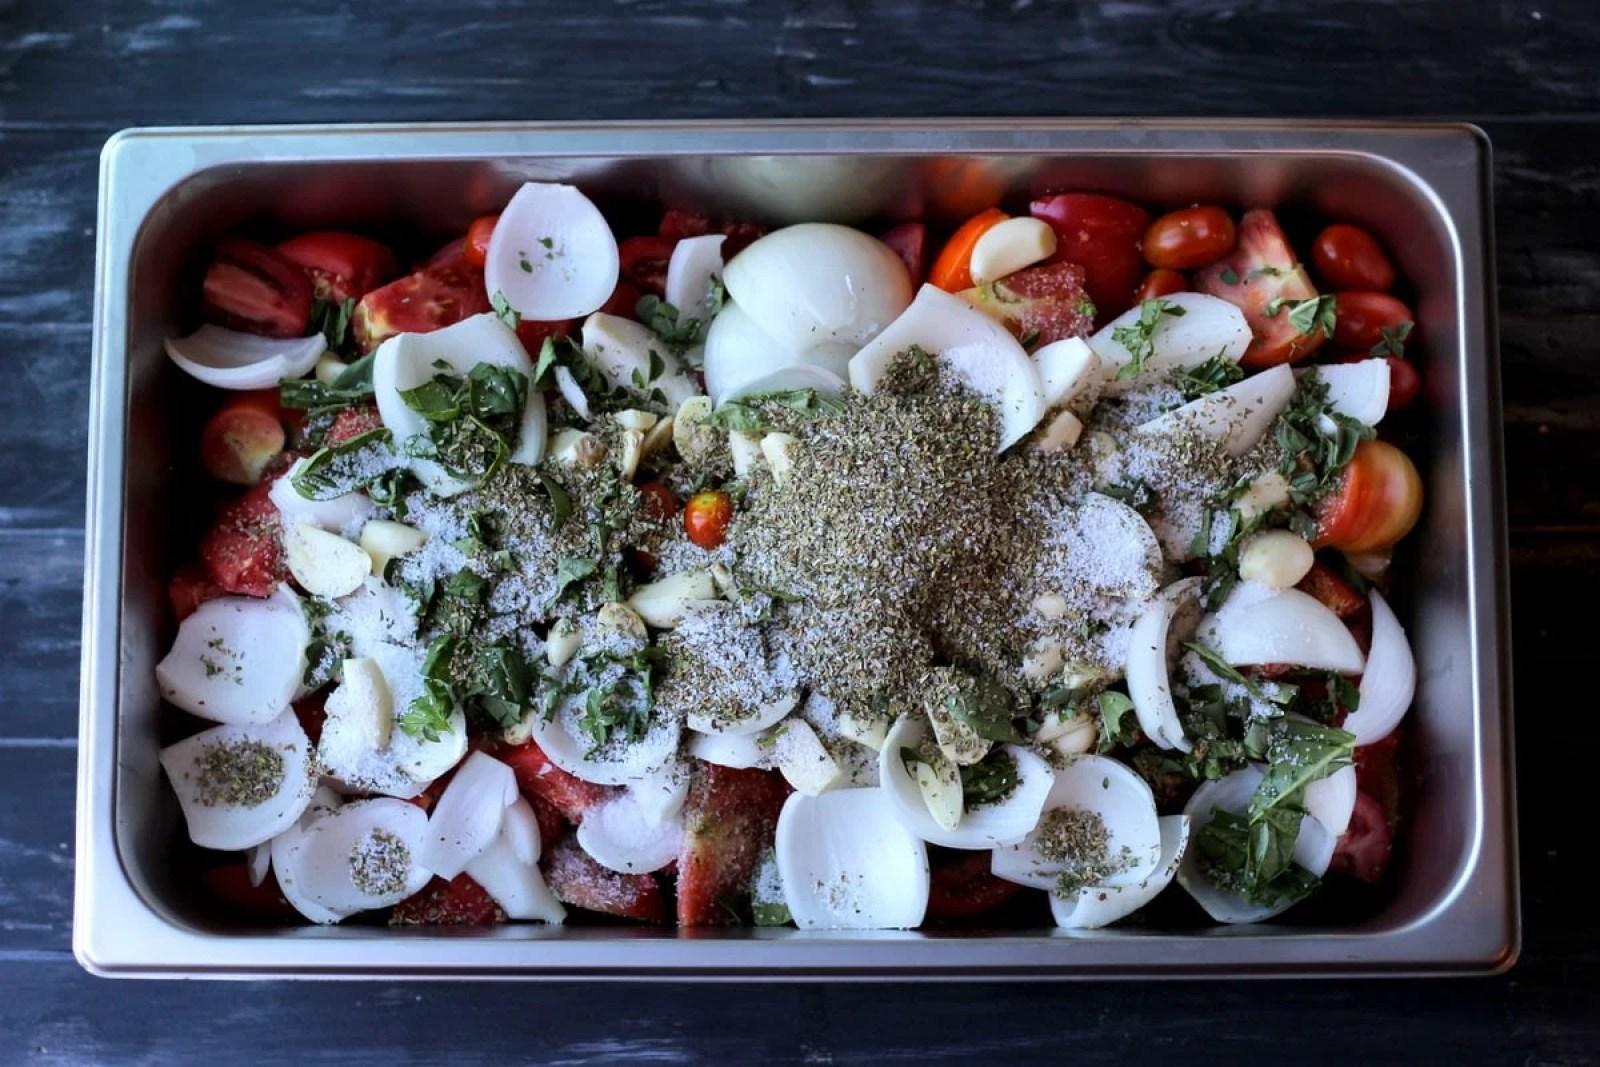 Making homemade marinara sauce thewoodenskillet.com